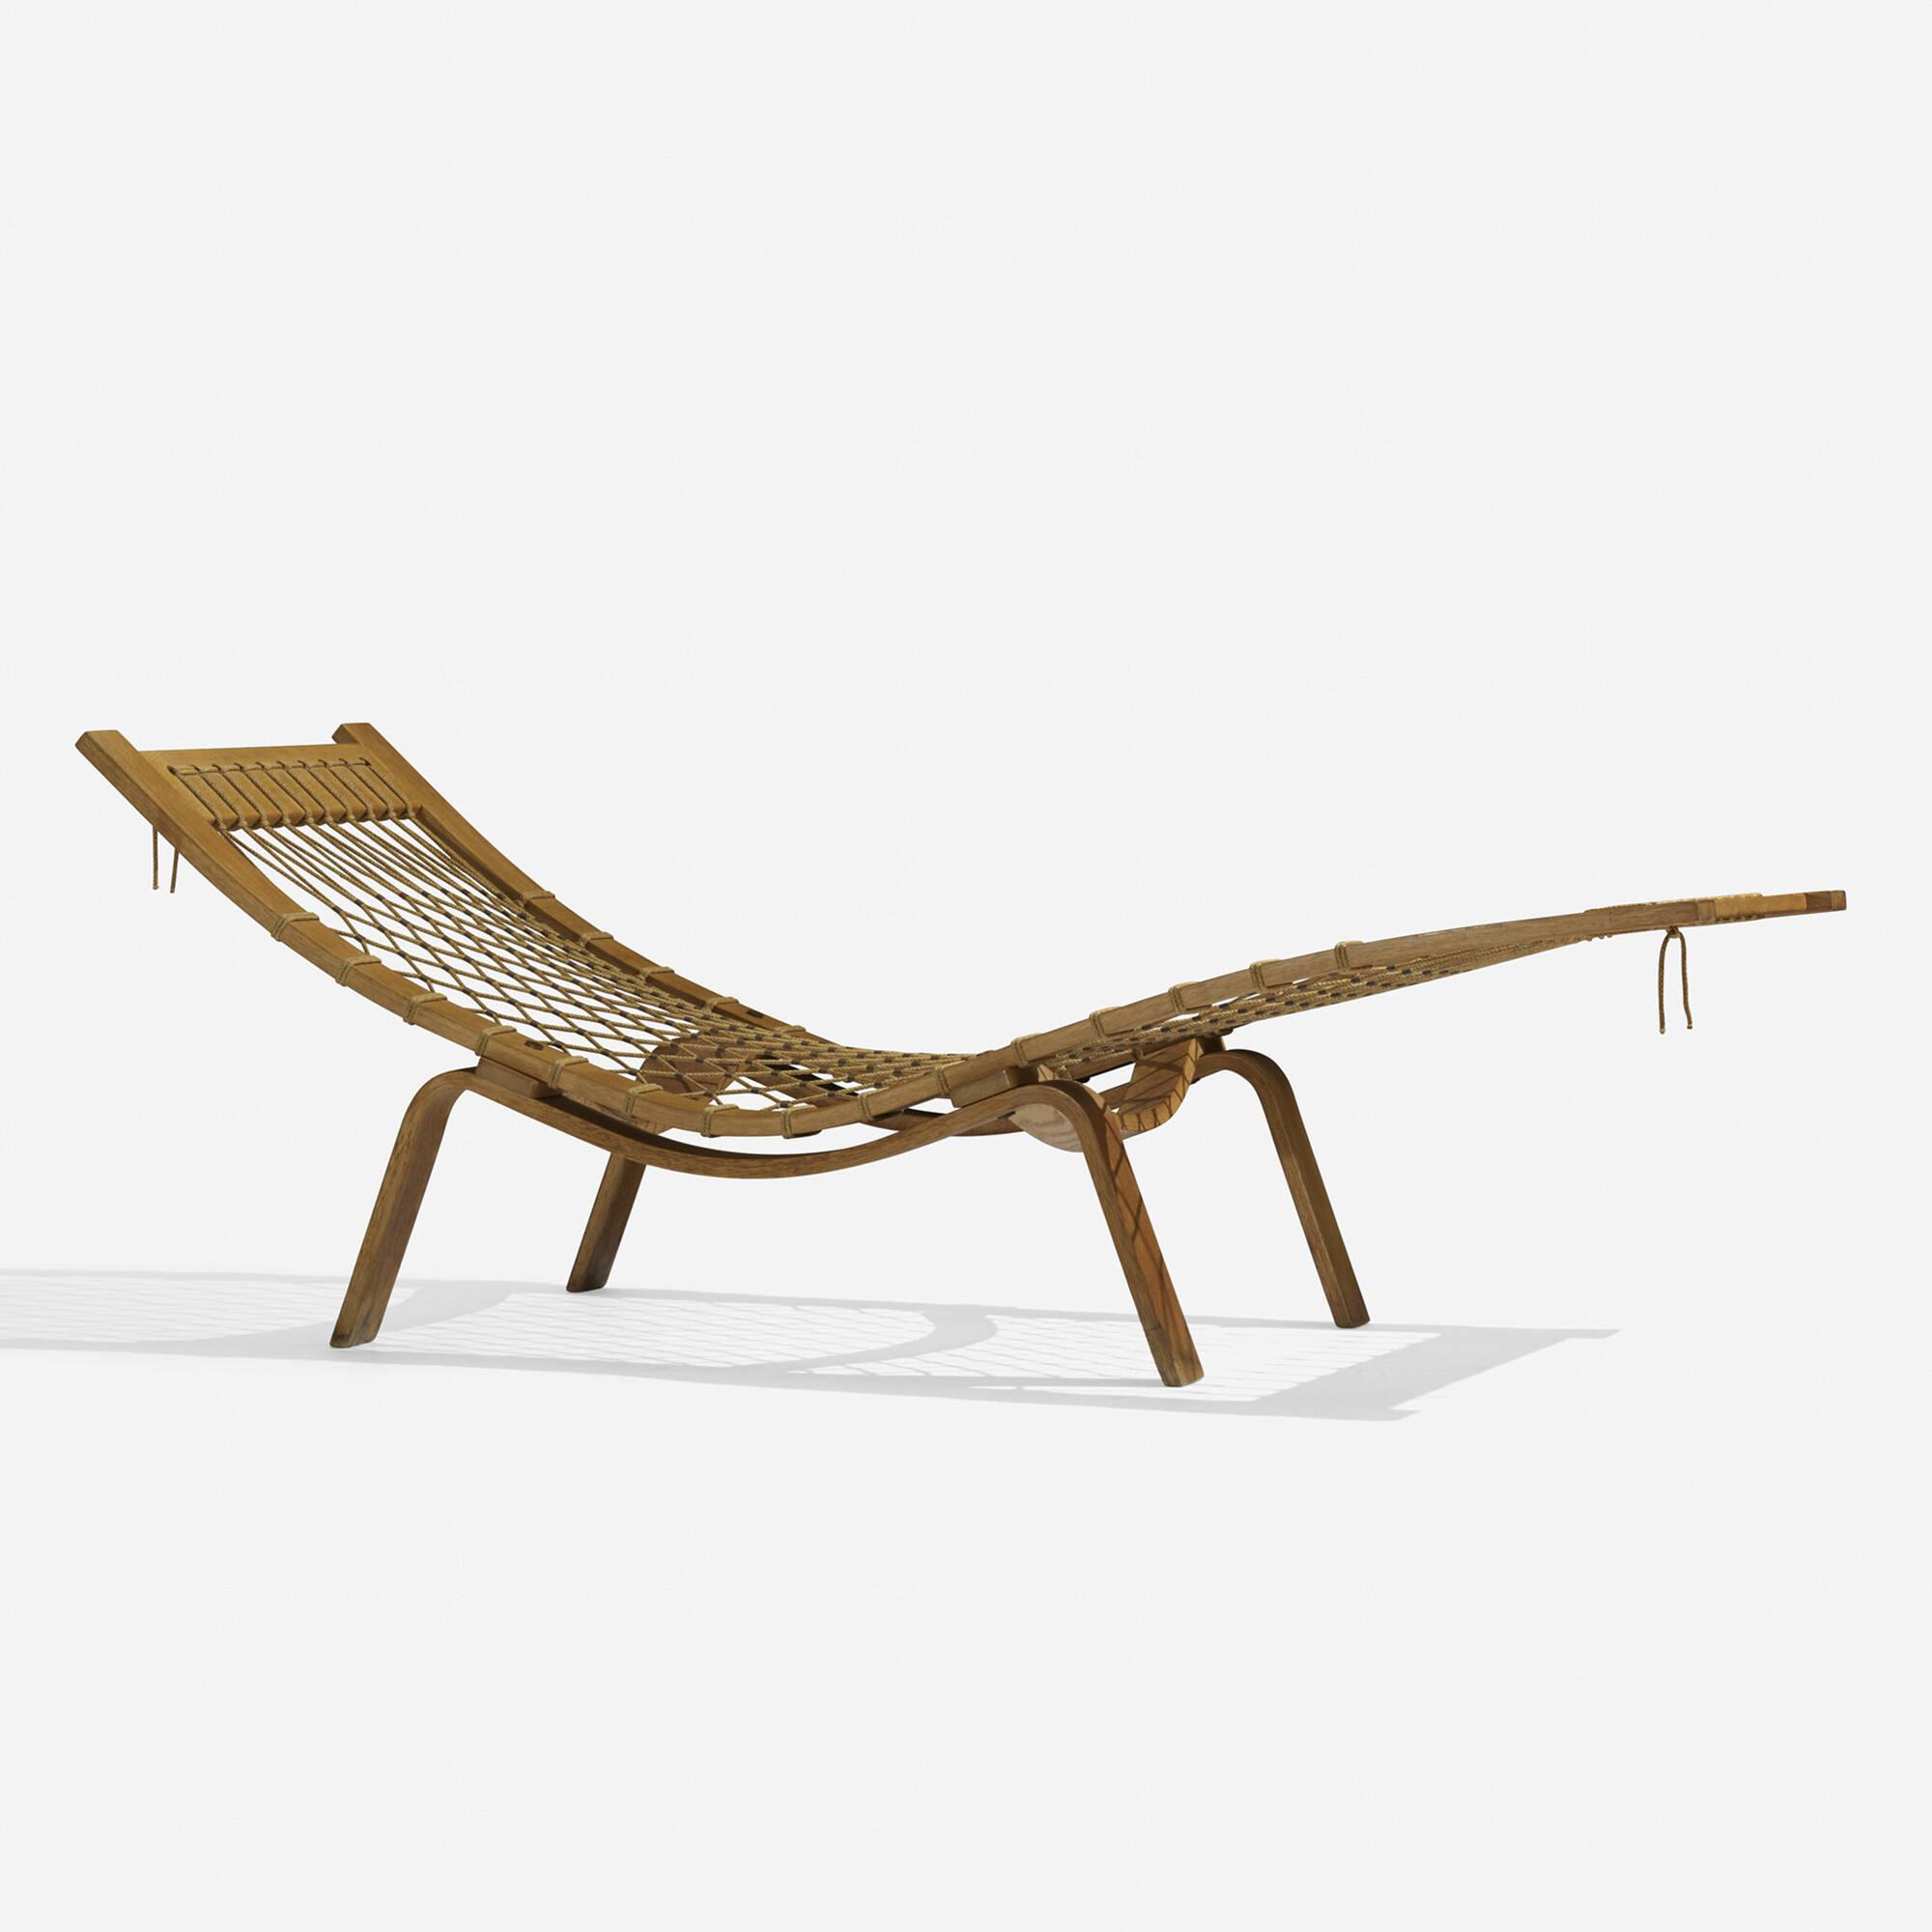 165: Hans J. Wegner / Hammock chaise (2 of 5)